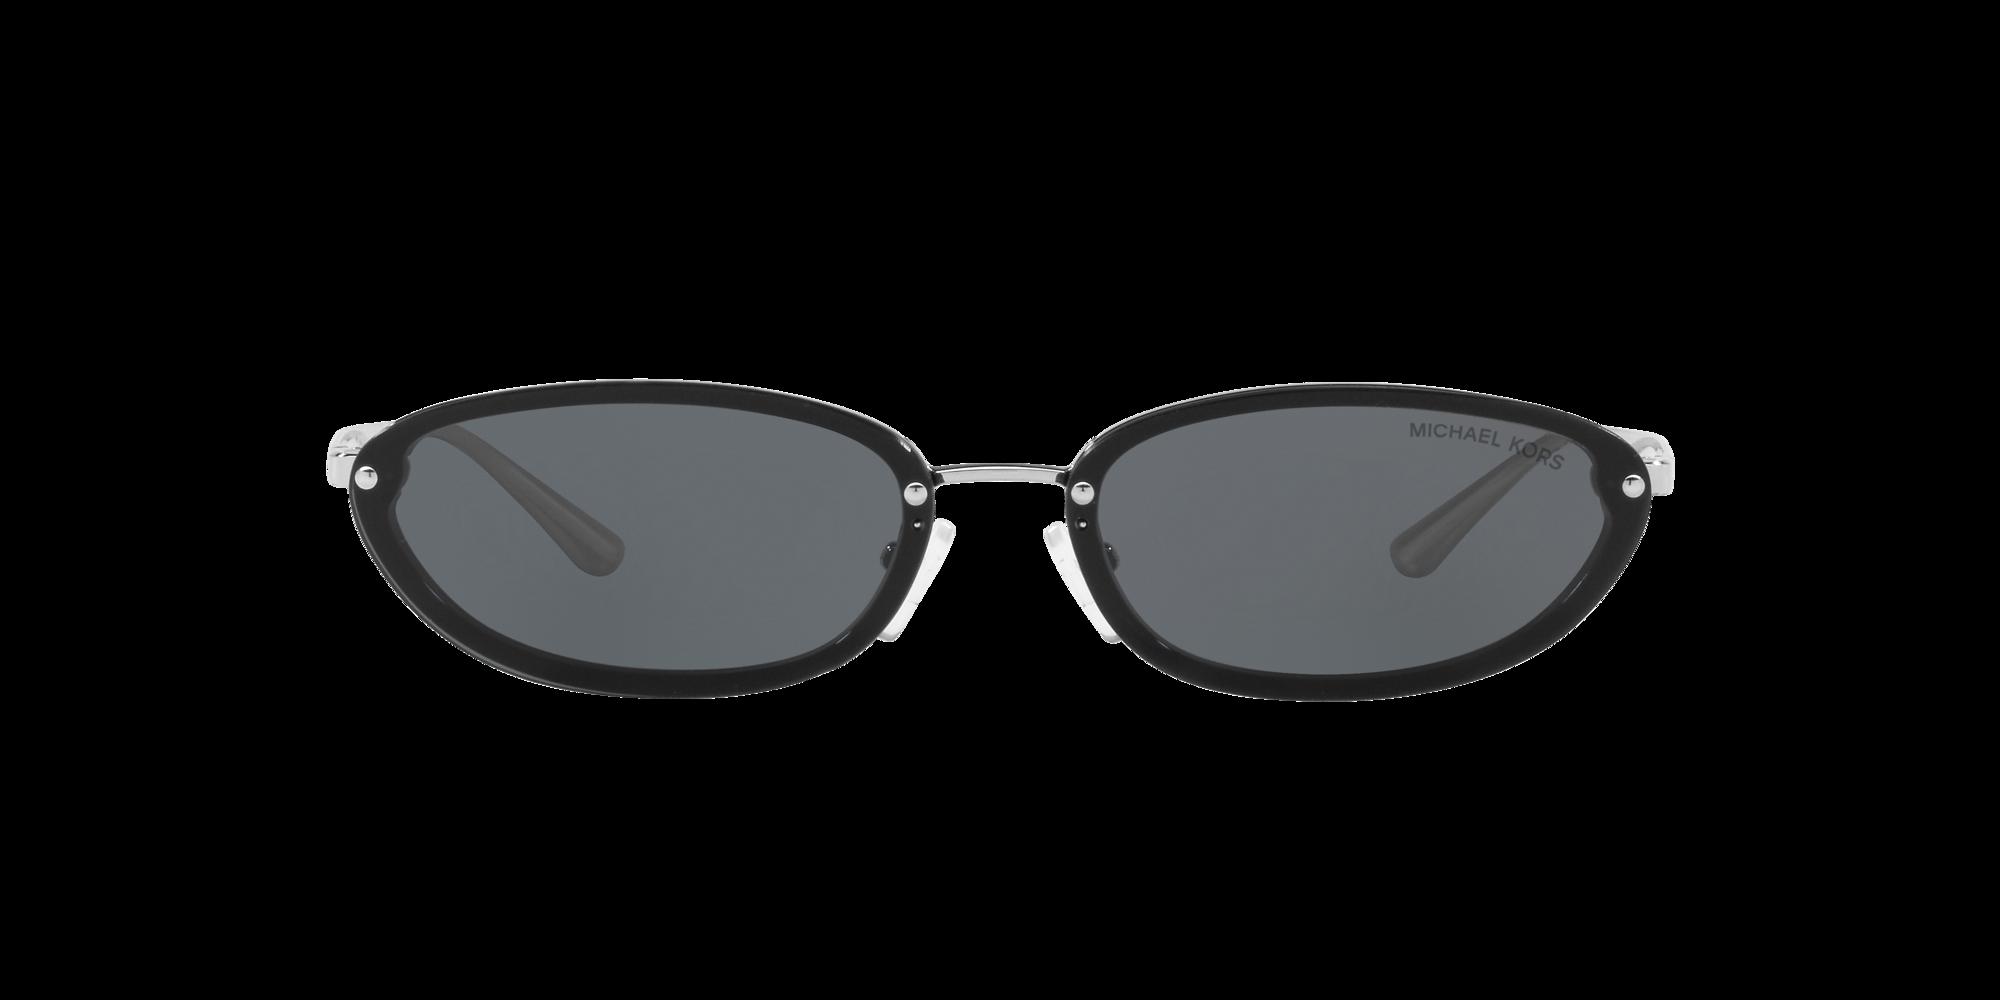 Image for MK2104 62 MIRAMAR from LensCrafters | Glasses, Prescription Glasses Online, Eyewear